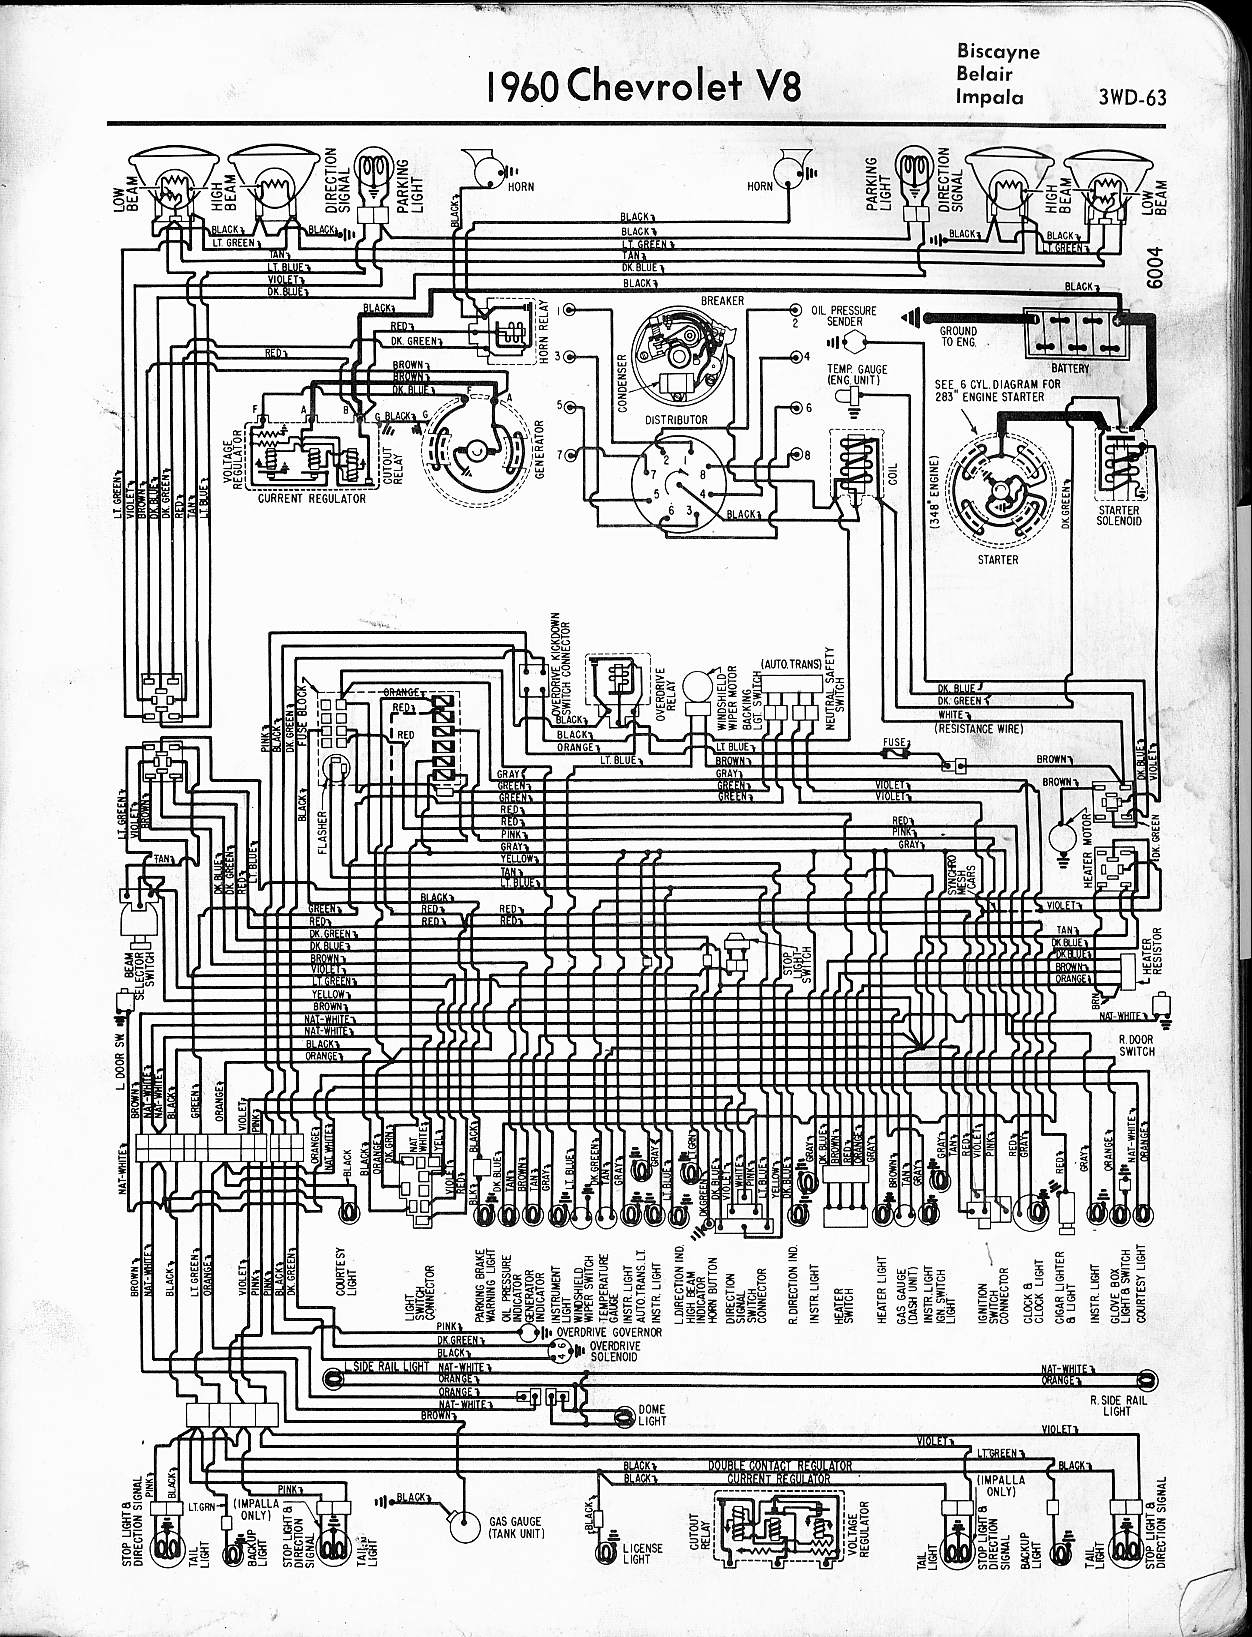 hight resolution of 2015 chevy silverado wiring diagram 1960 v8 biscayne belair impala 5c